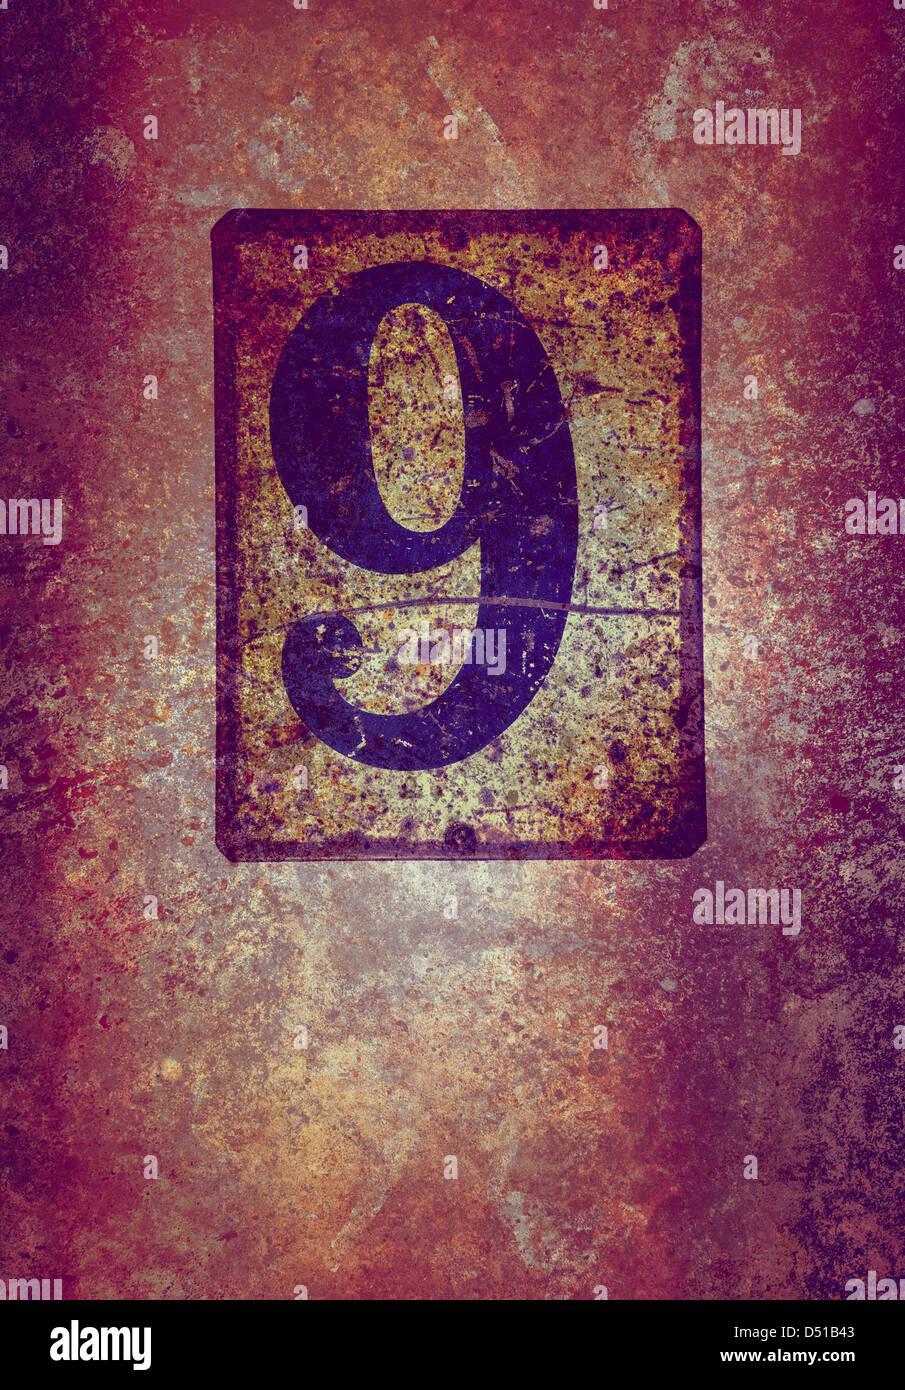 grunge 9 Immagini Stock